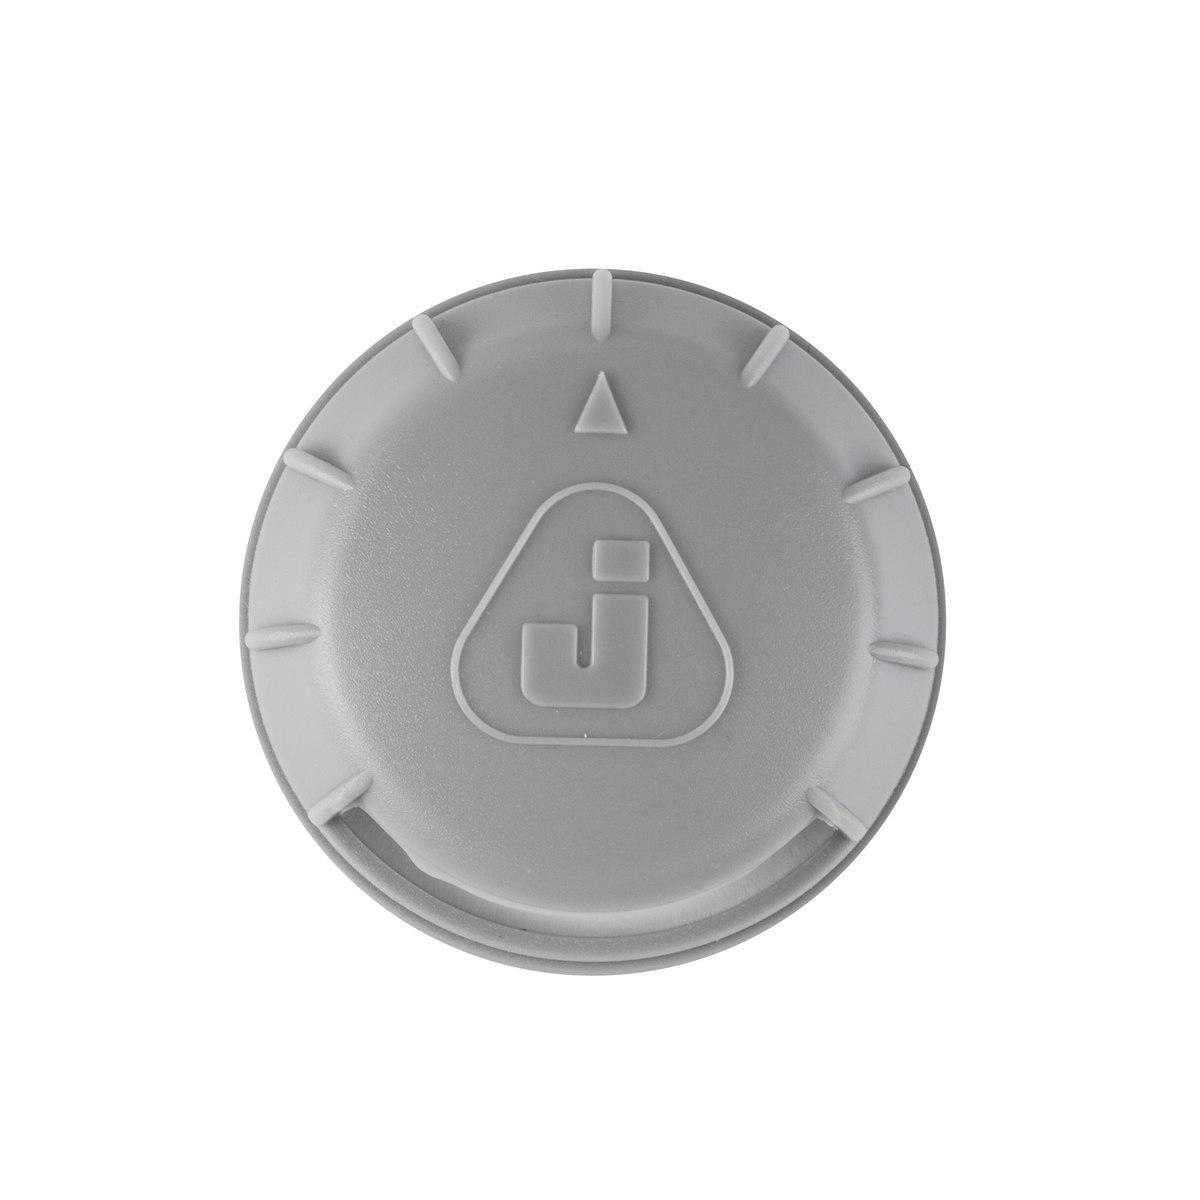 js 65205 - 65205 Защита клапана полумаски Jeta Safety 6500